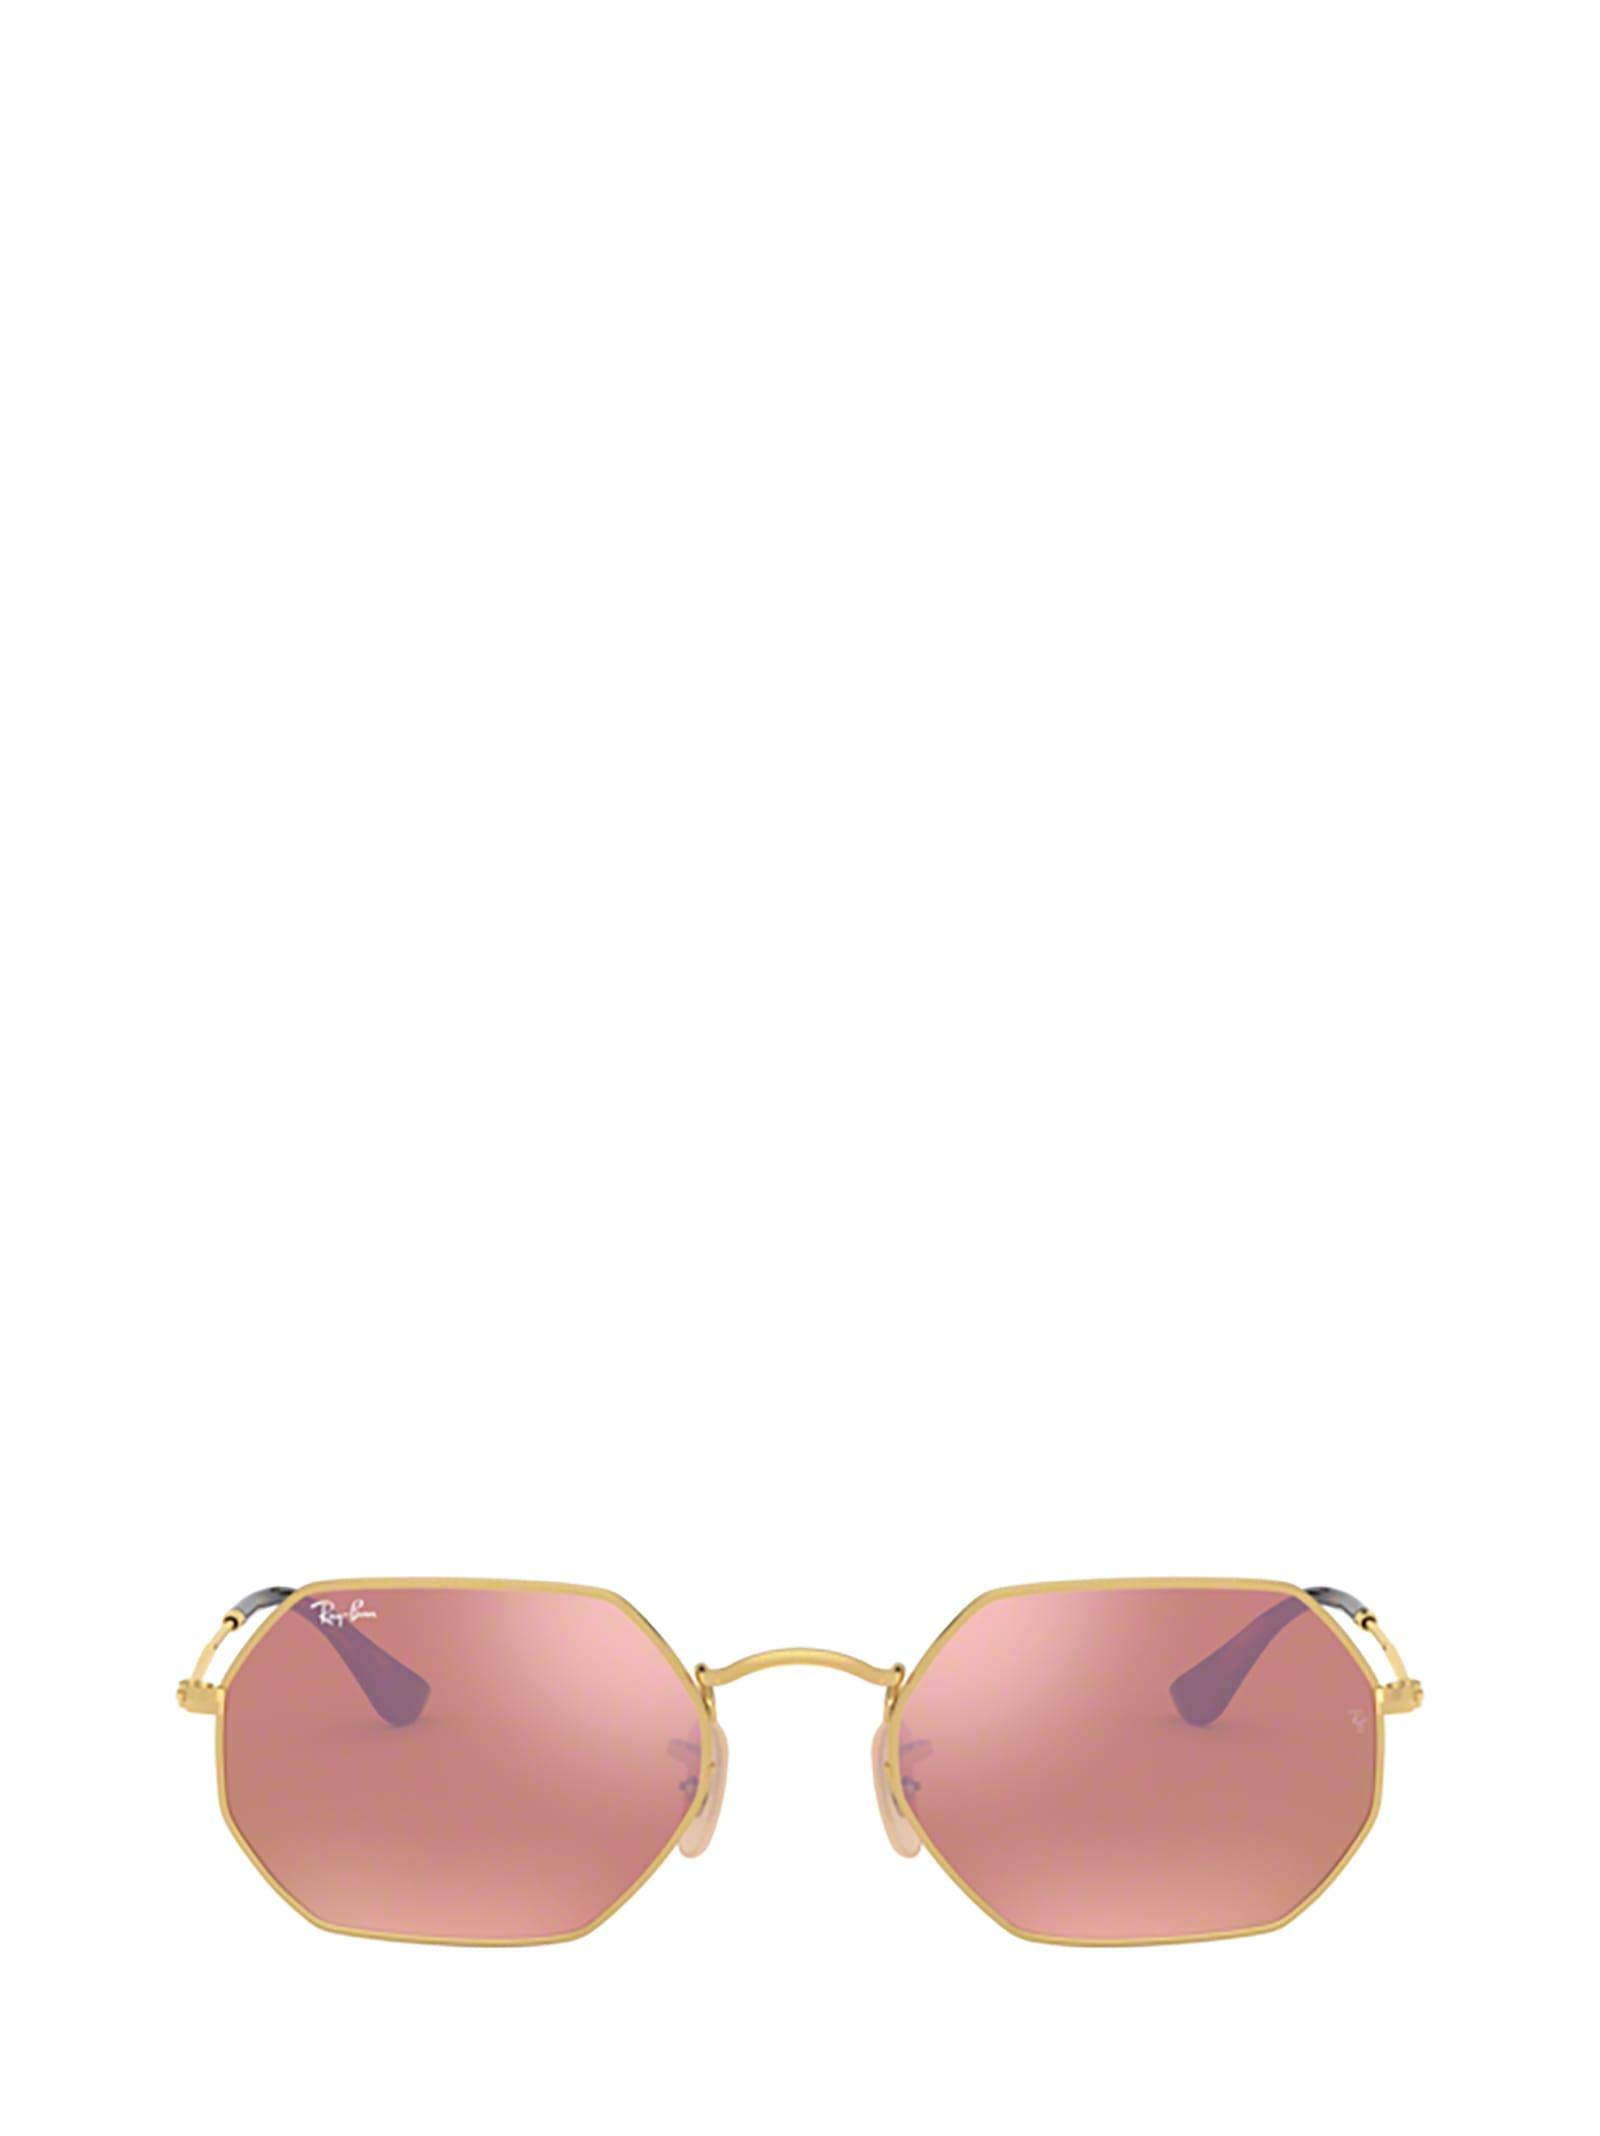 Ray-Ban Ray-ban Rb3556n Arista Sunglasses